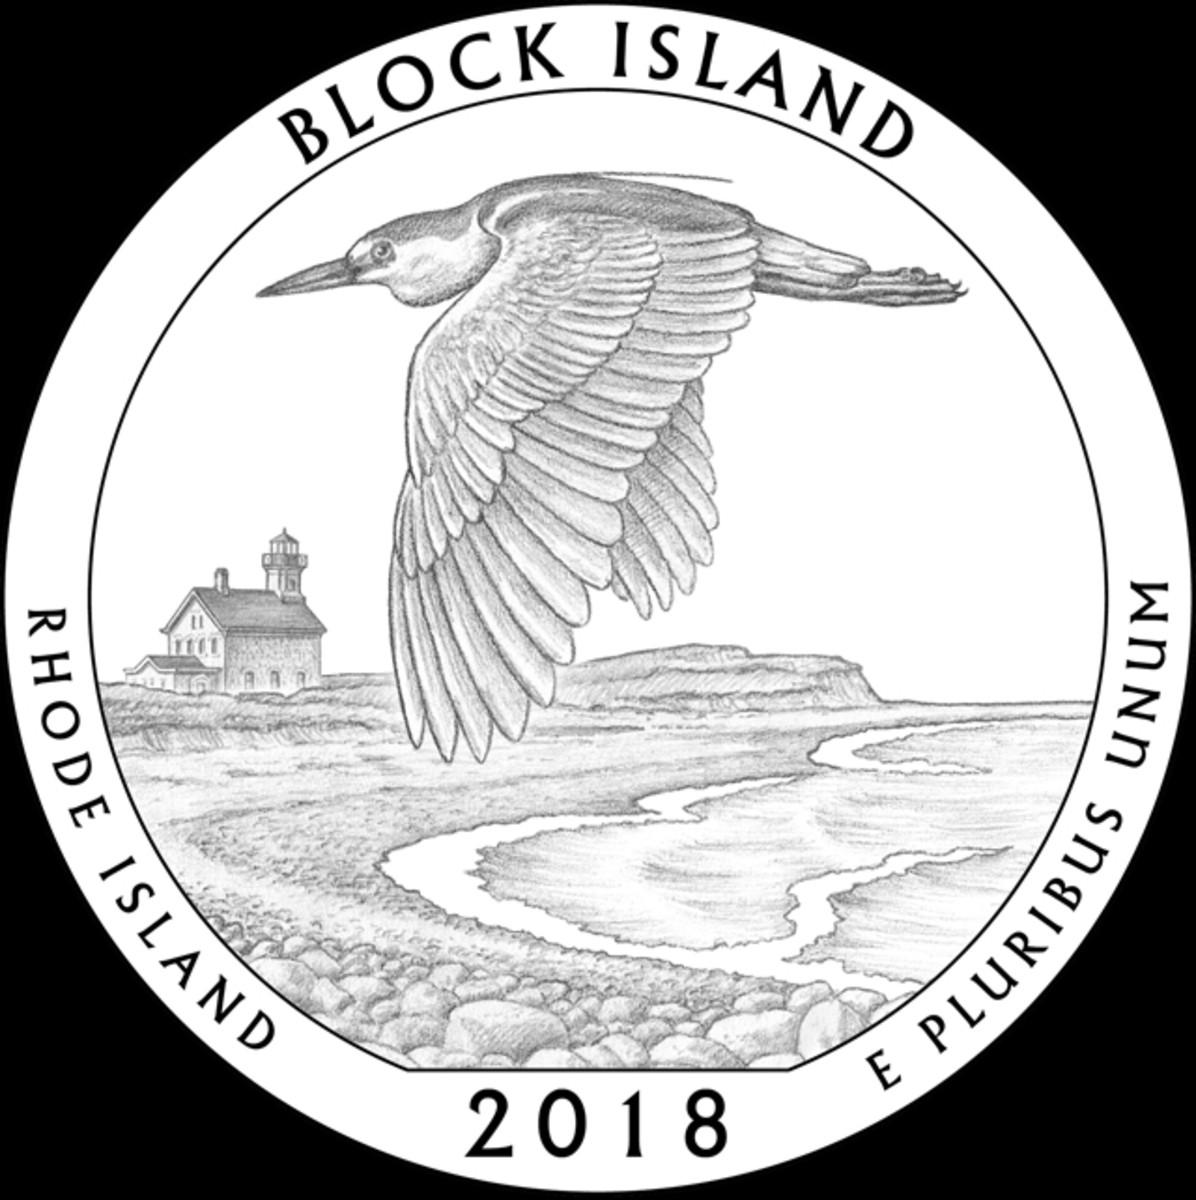 The CFA choose RI-02 for the Block Island National Wildlife Refuge.